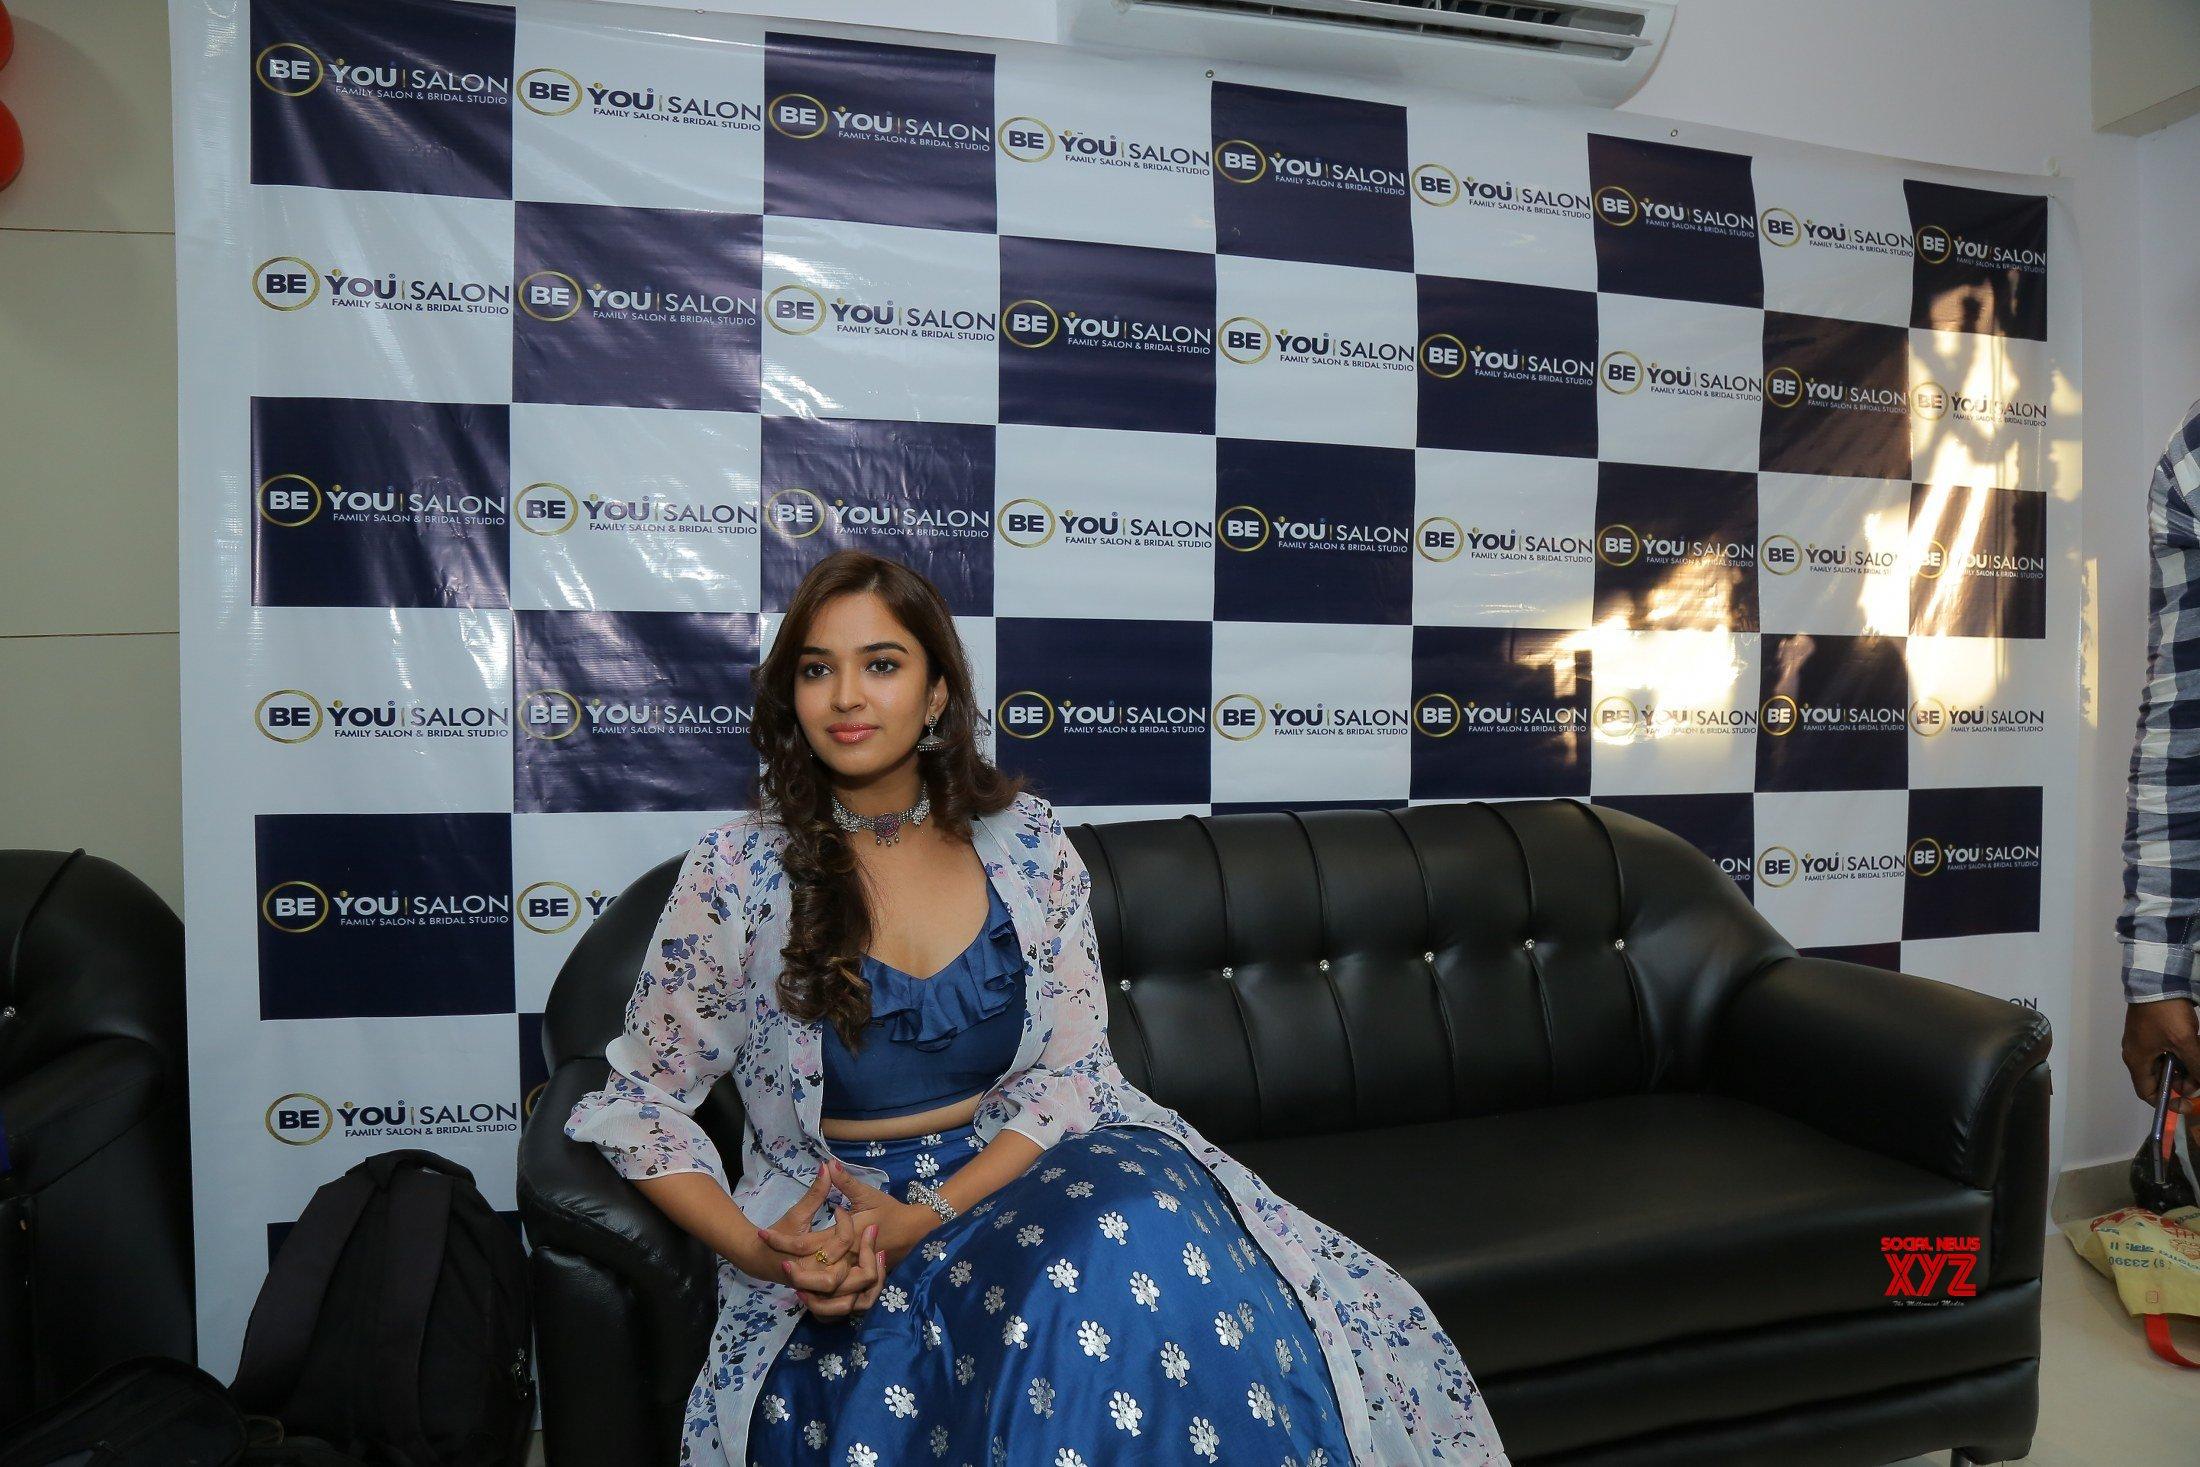 Actress Pujitha Ponnada Inaugurates BeYou Salon At Bhimavaram - Gallery